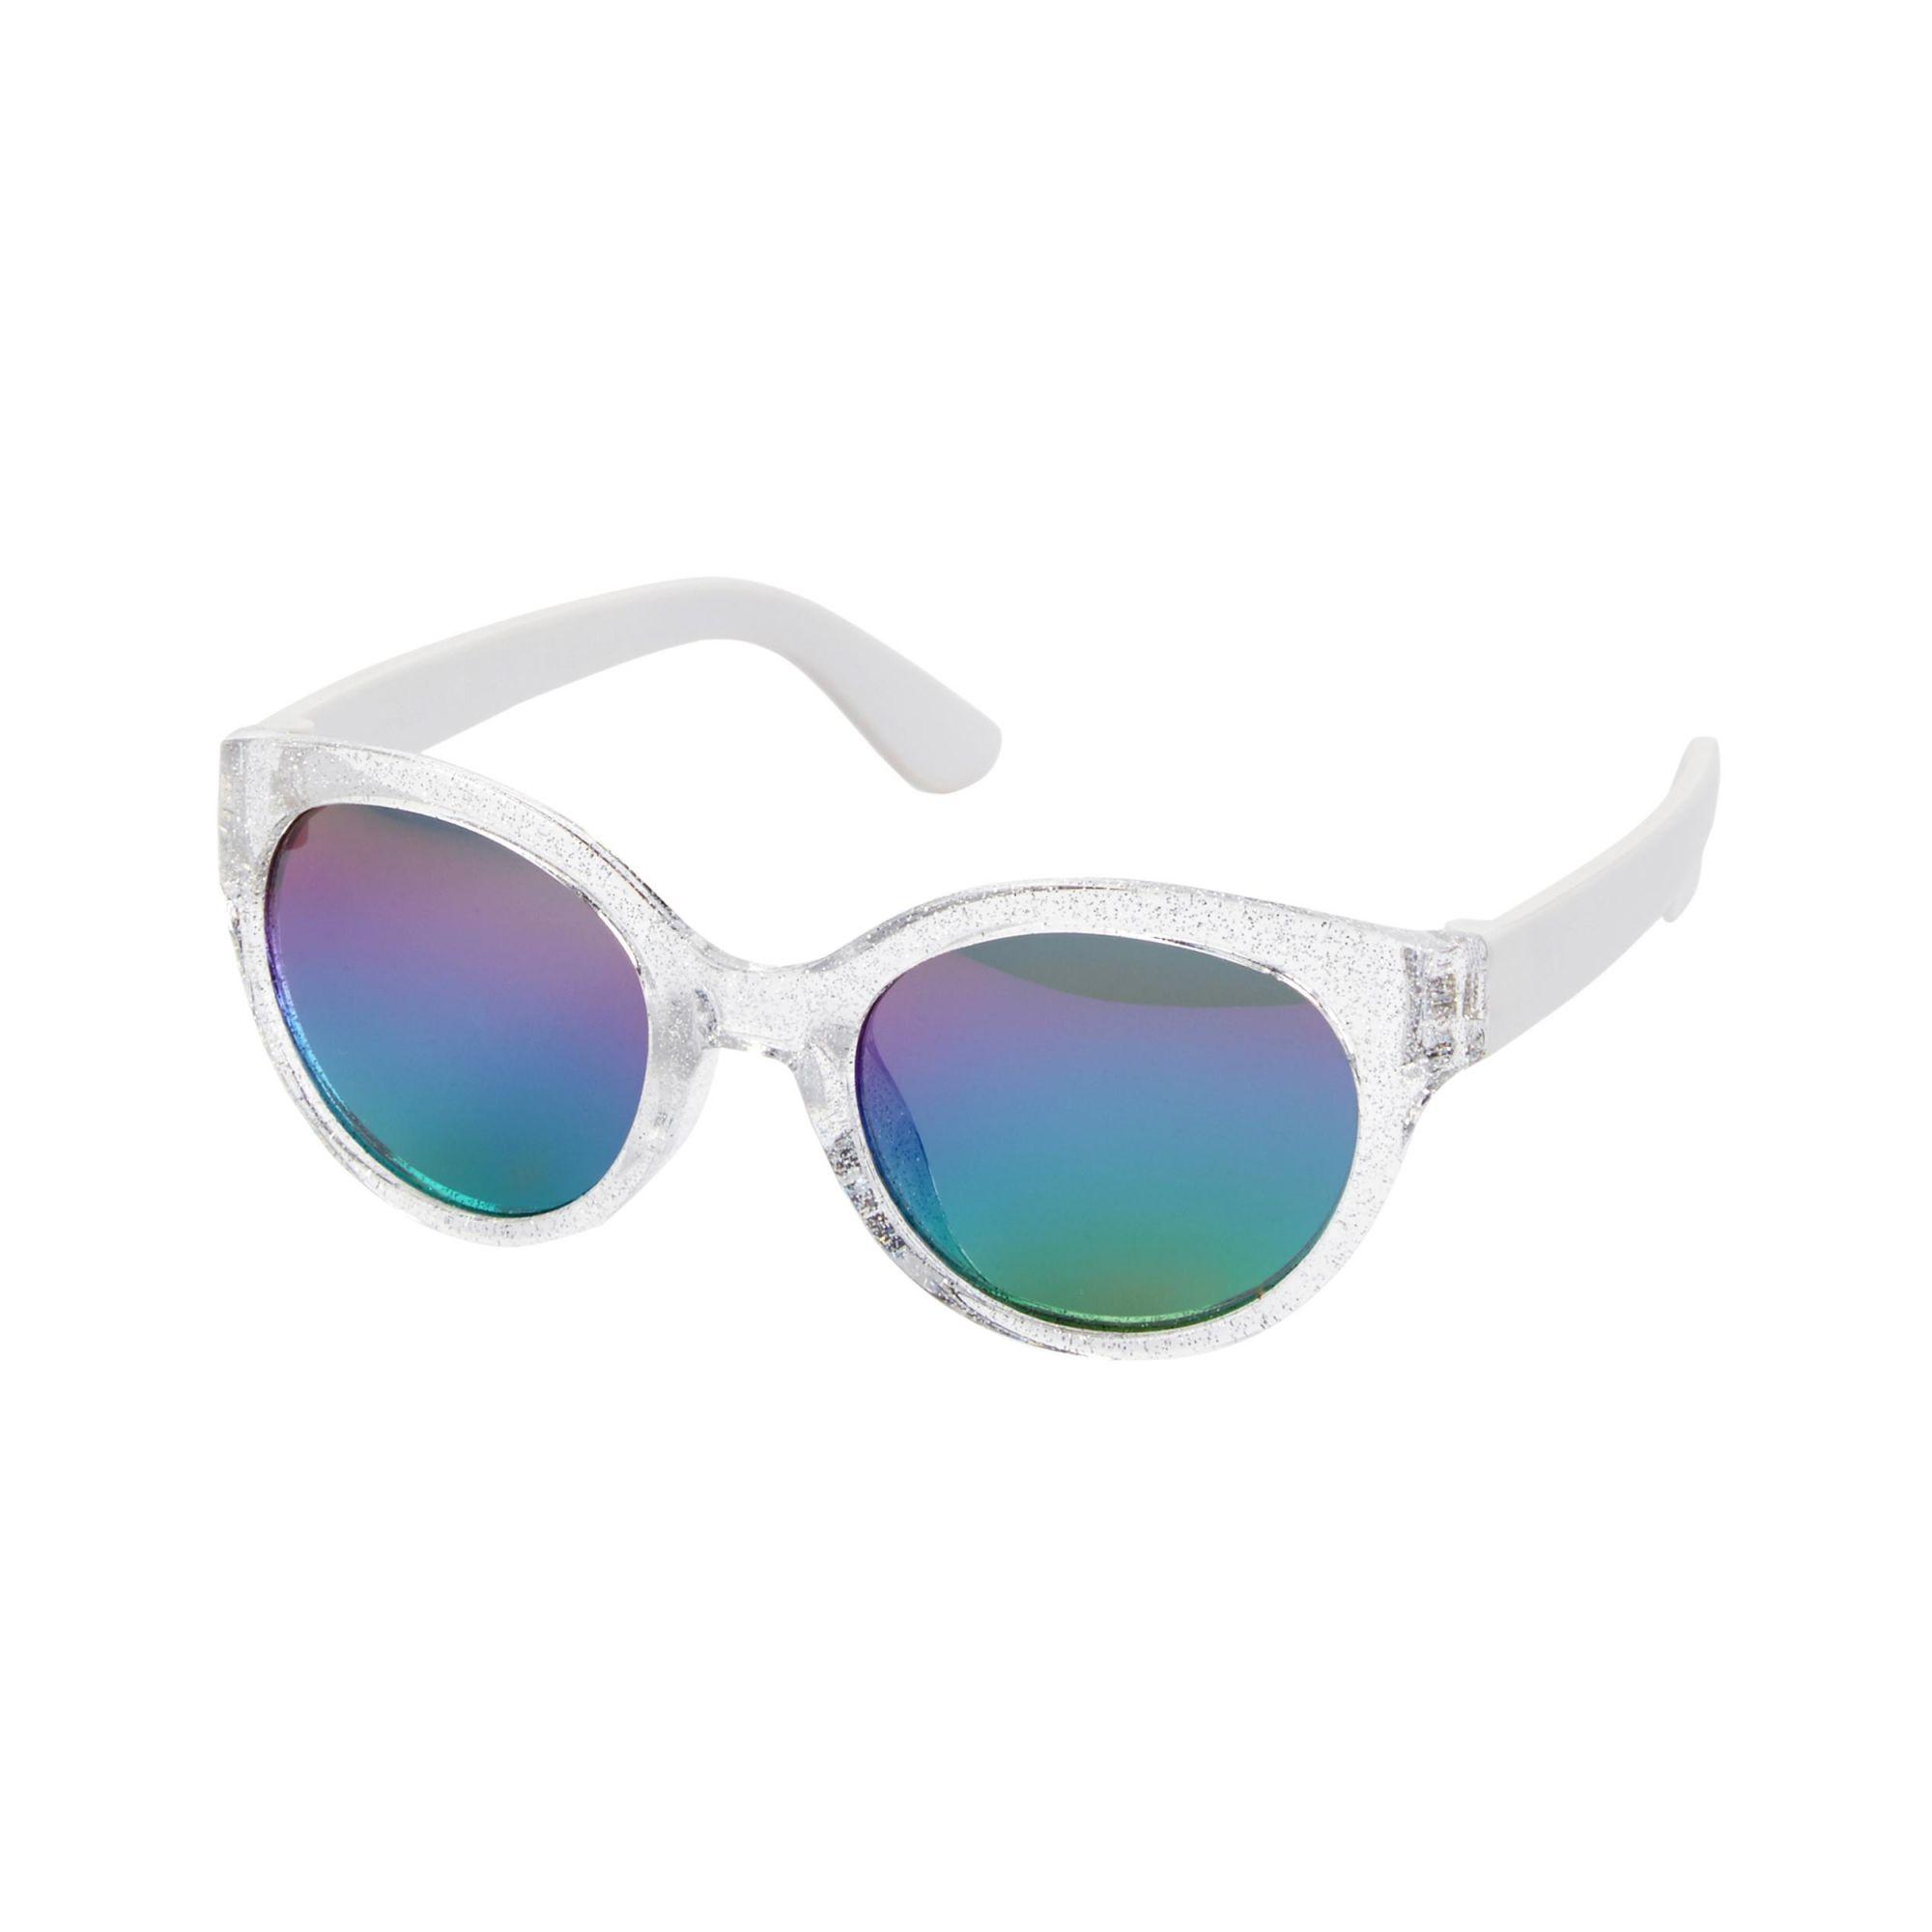 Óculos de sol prata gatinha - Carters  - Kaiuru Kids